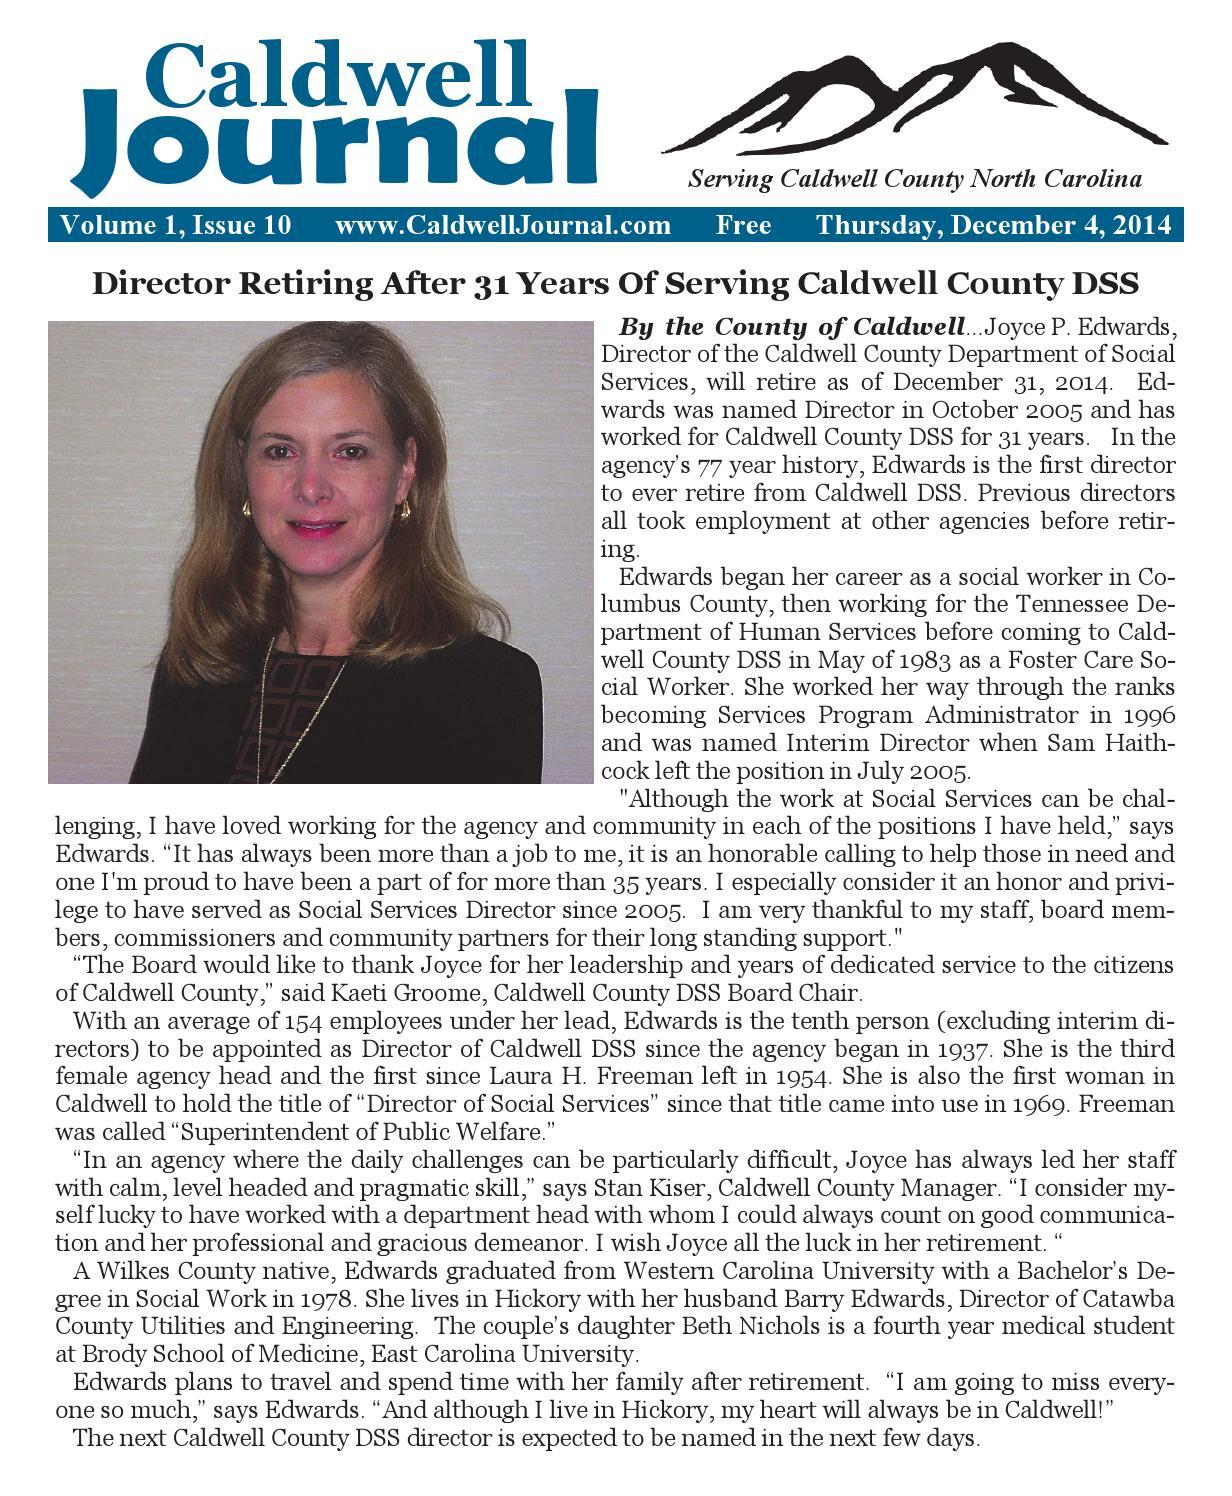 Caldwell Journal 12 04 2014 By Caldwell Journal Issuu